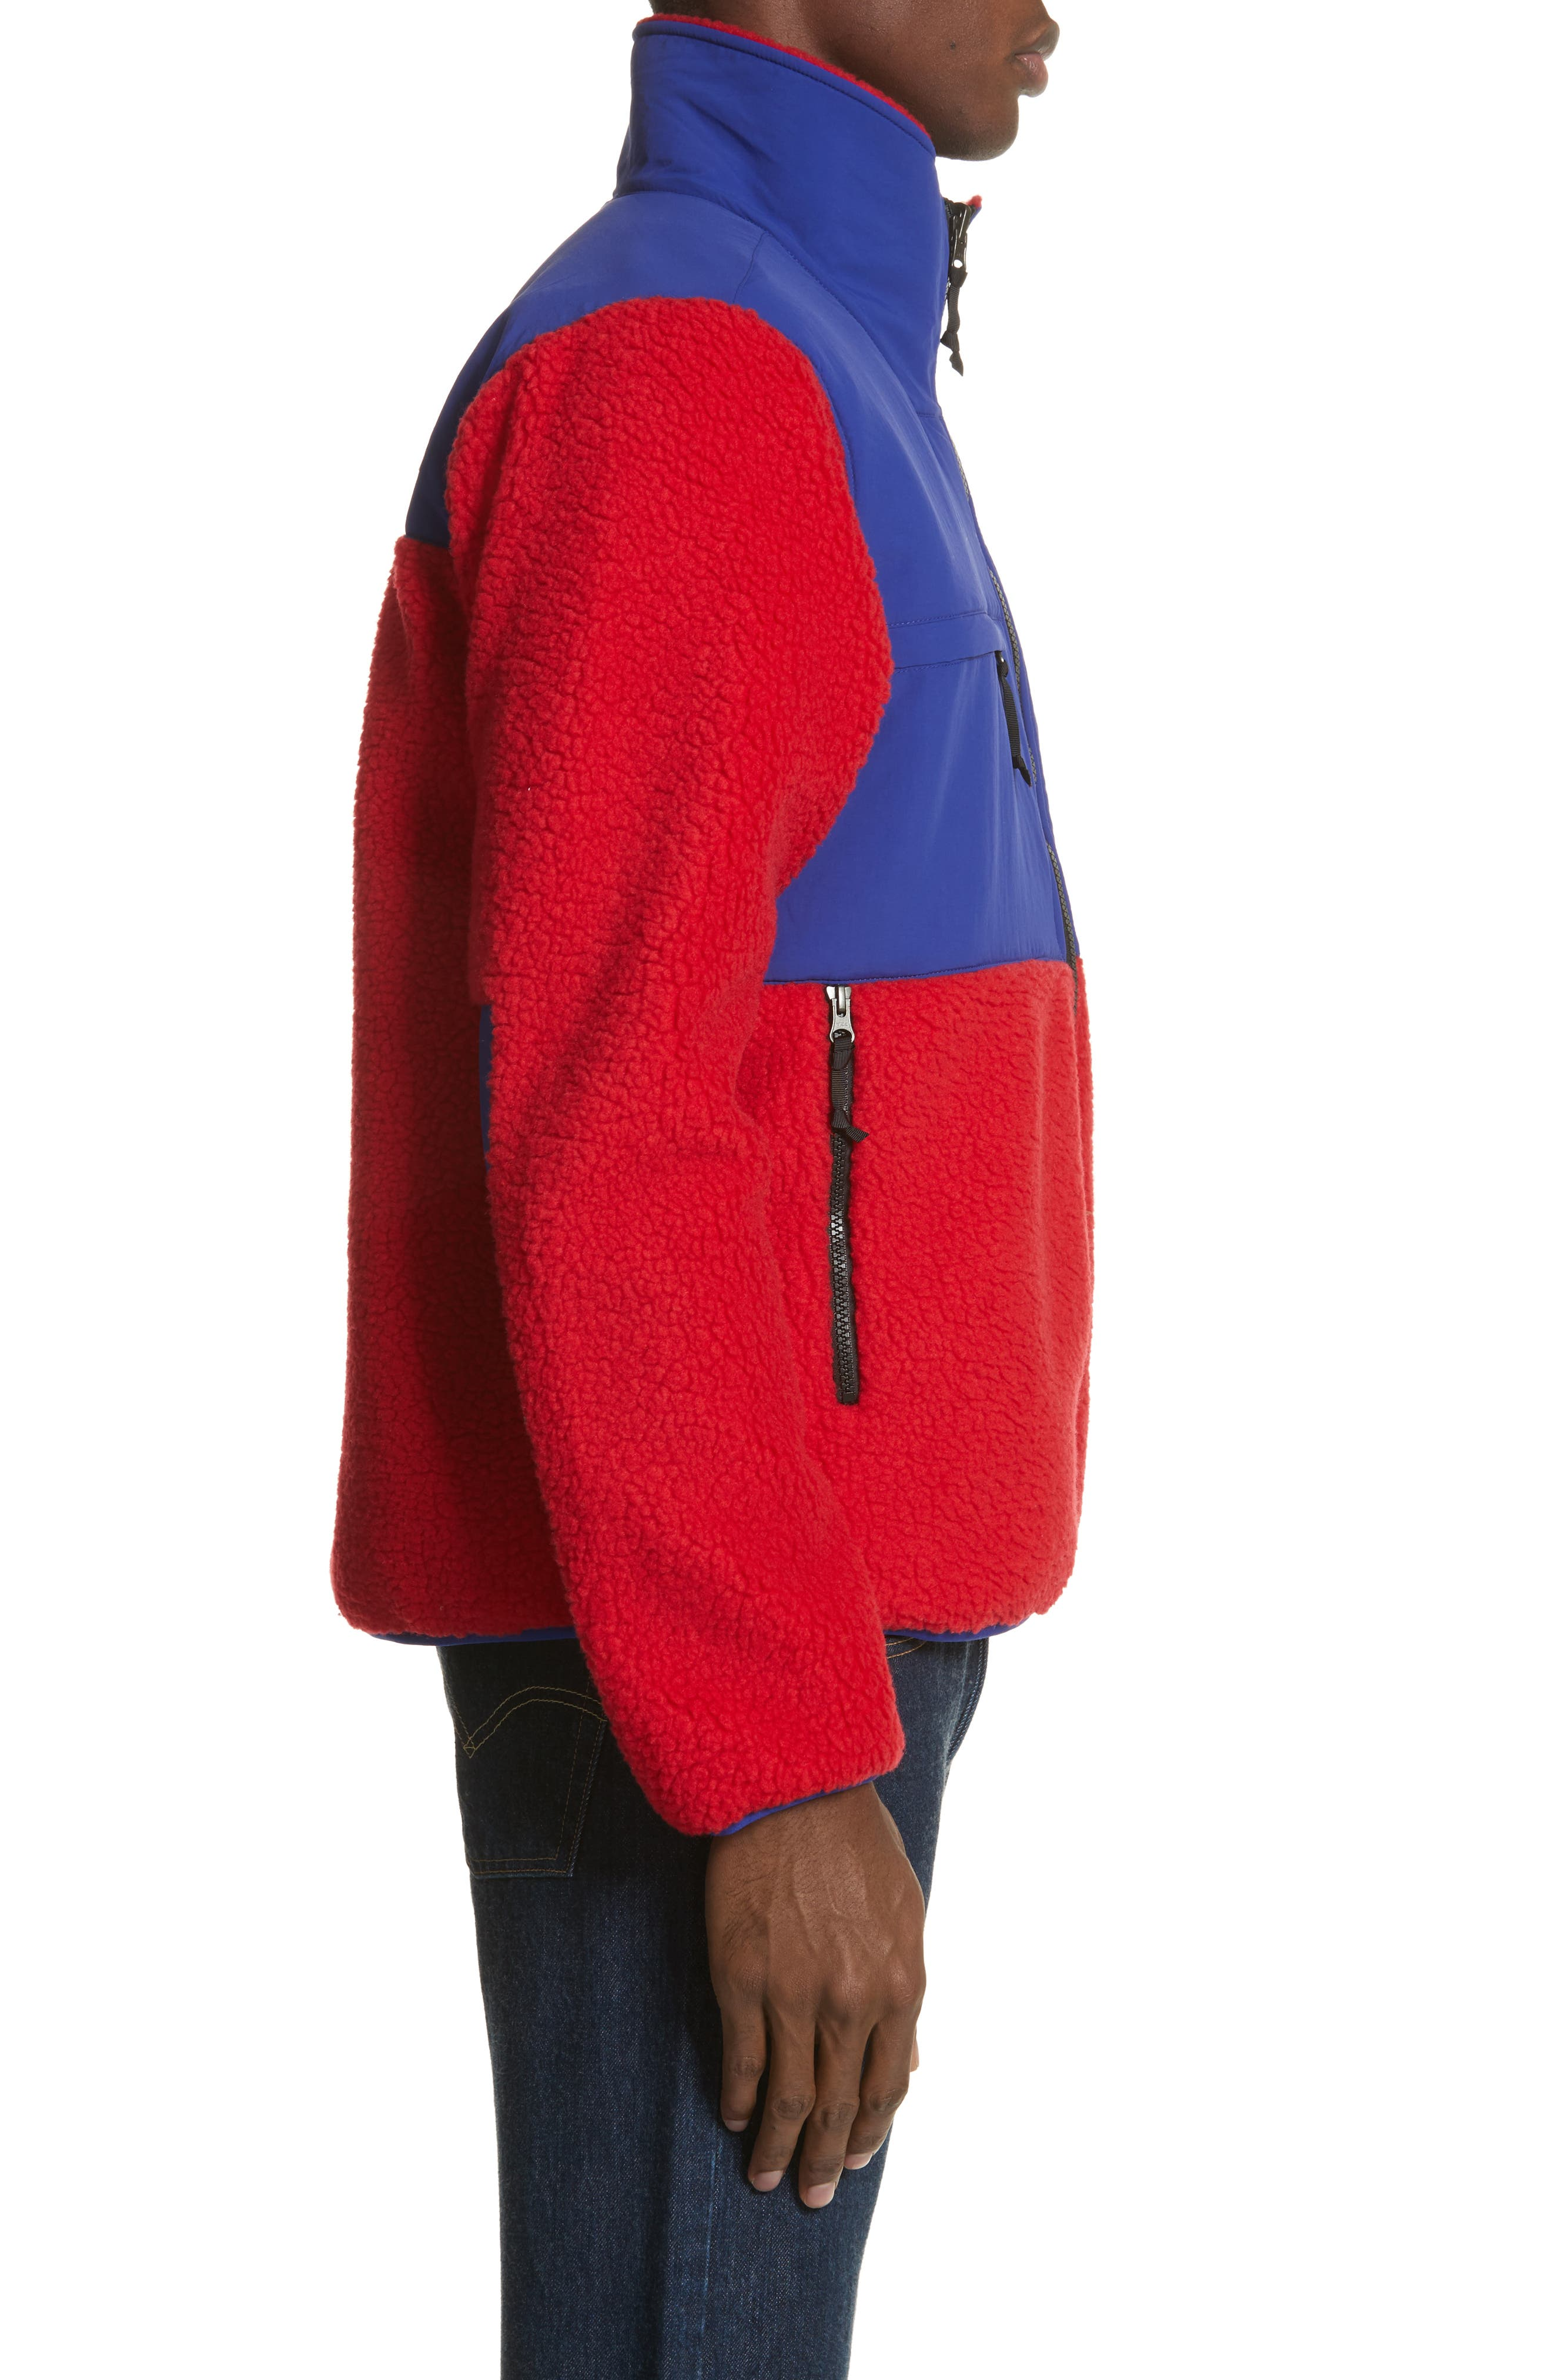 Denali Jacket,                             Alternate thumbnail 9, color,                             Tnf Red